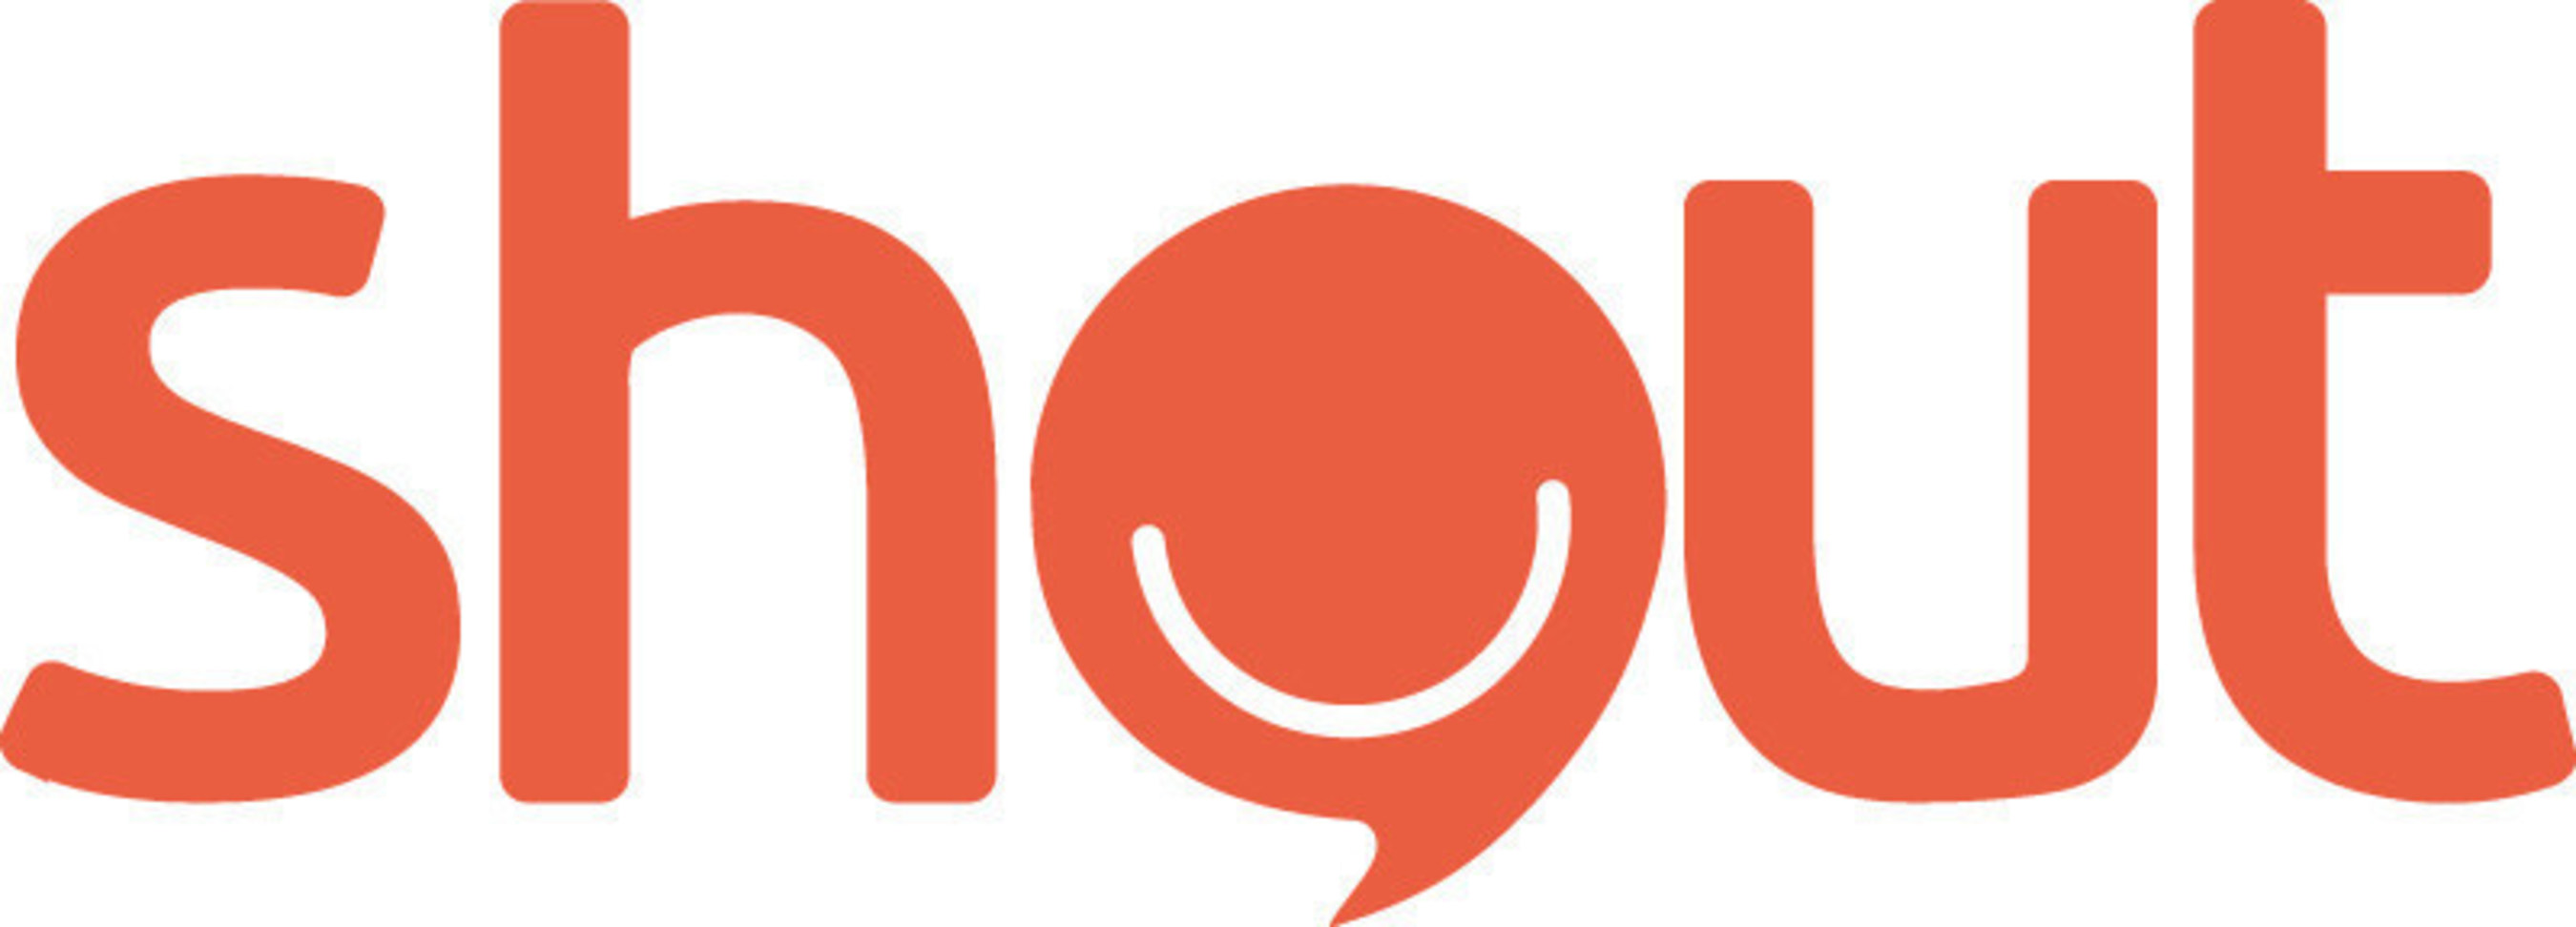 Shout the Good logo